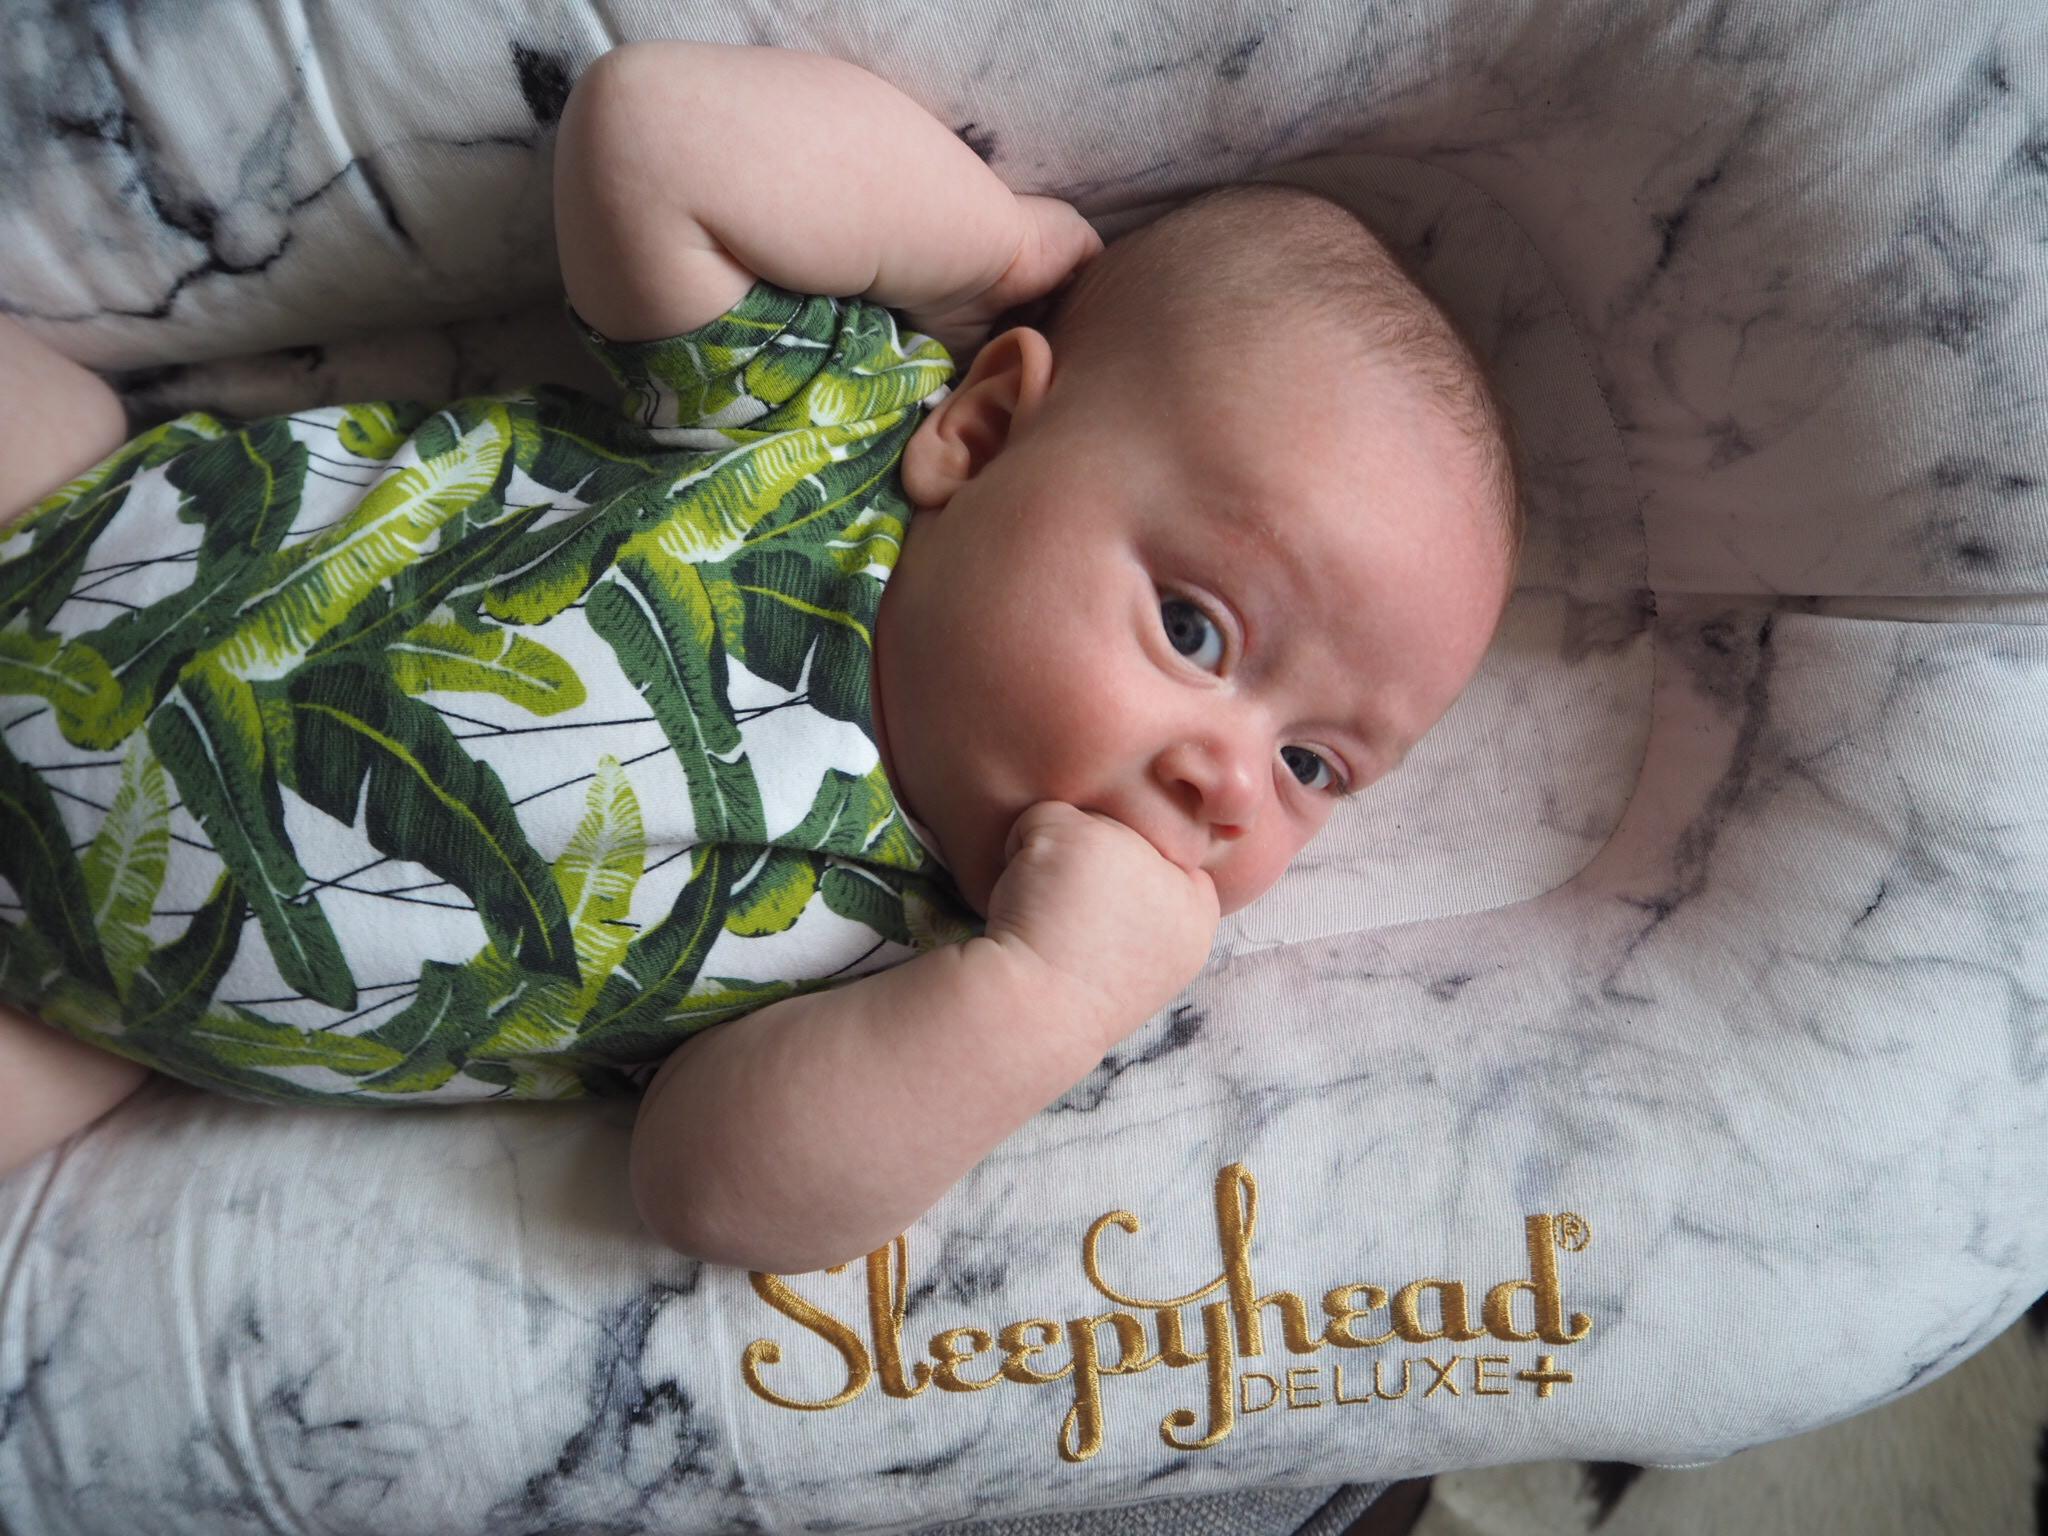 Sleepyhead deluxe+ marble print